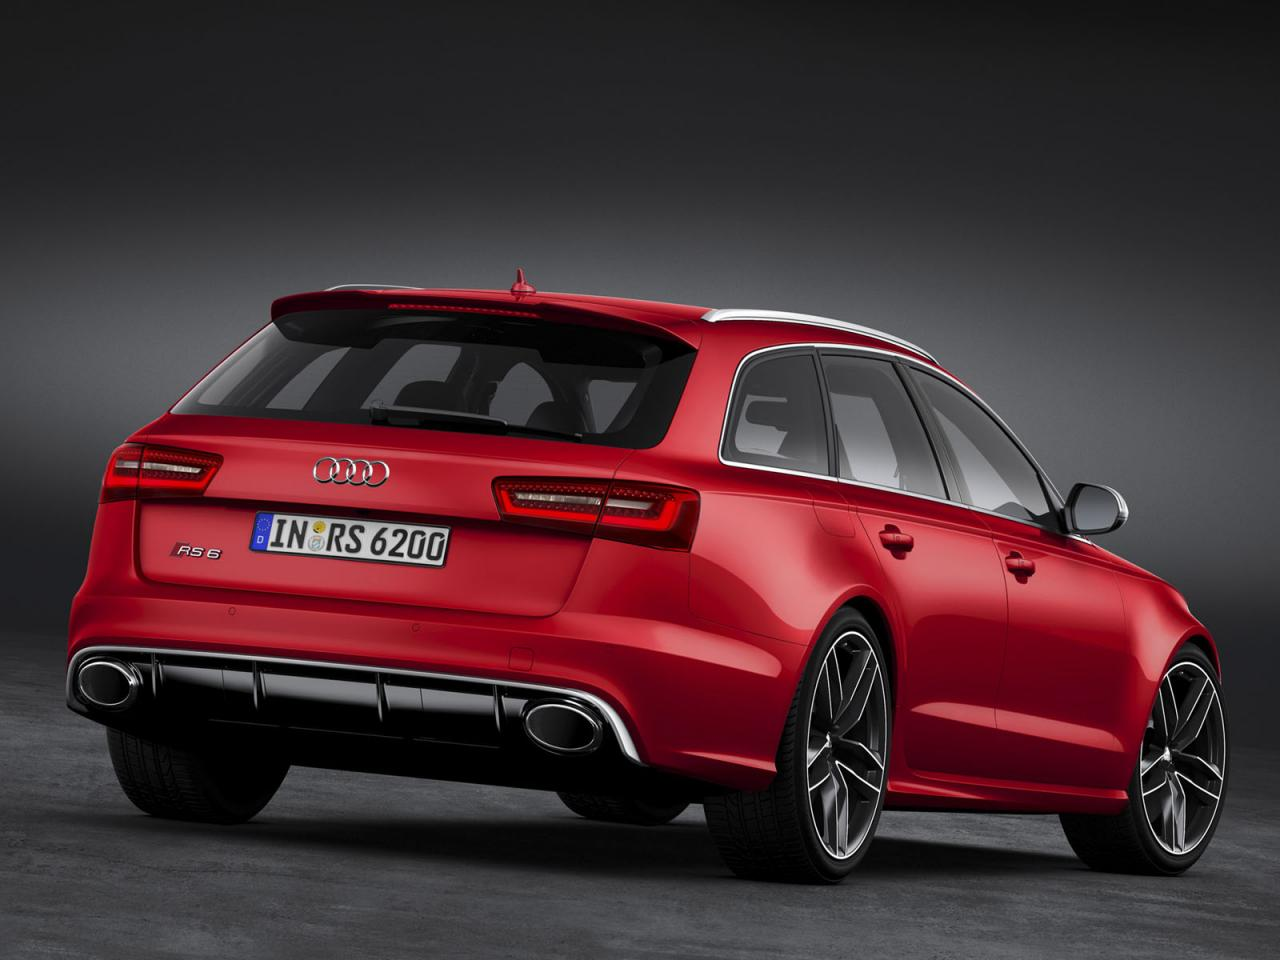 [Resim: Audi+RS6+Avant+2.jpg]